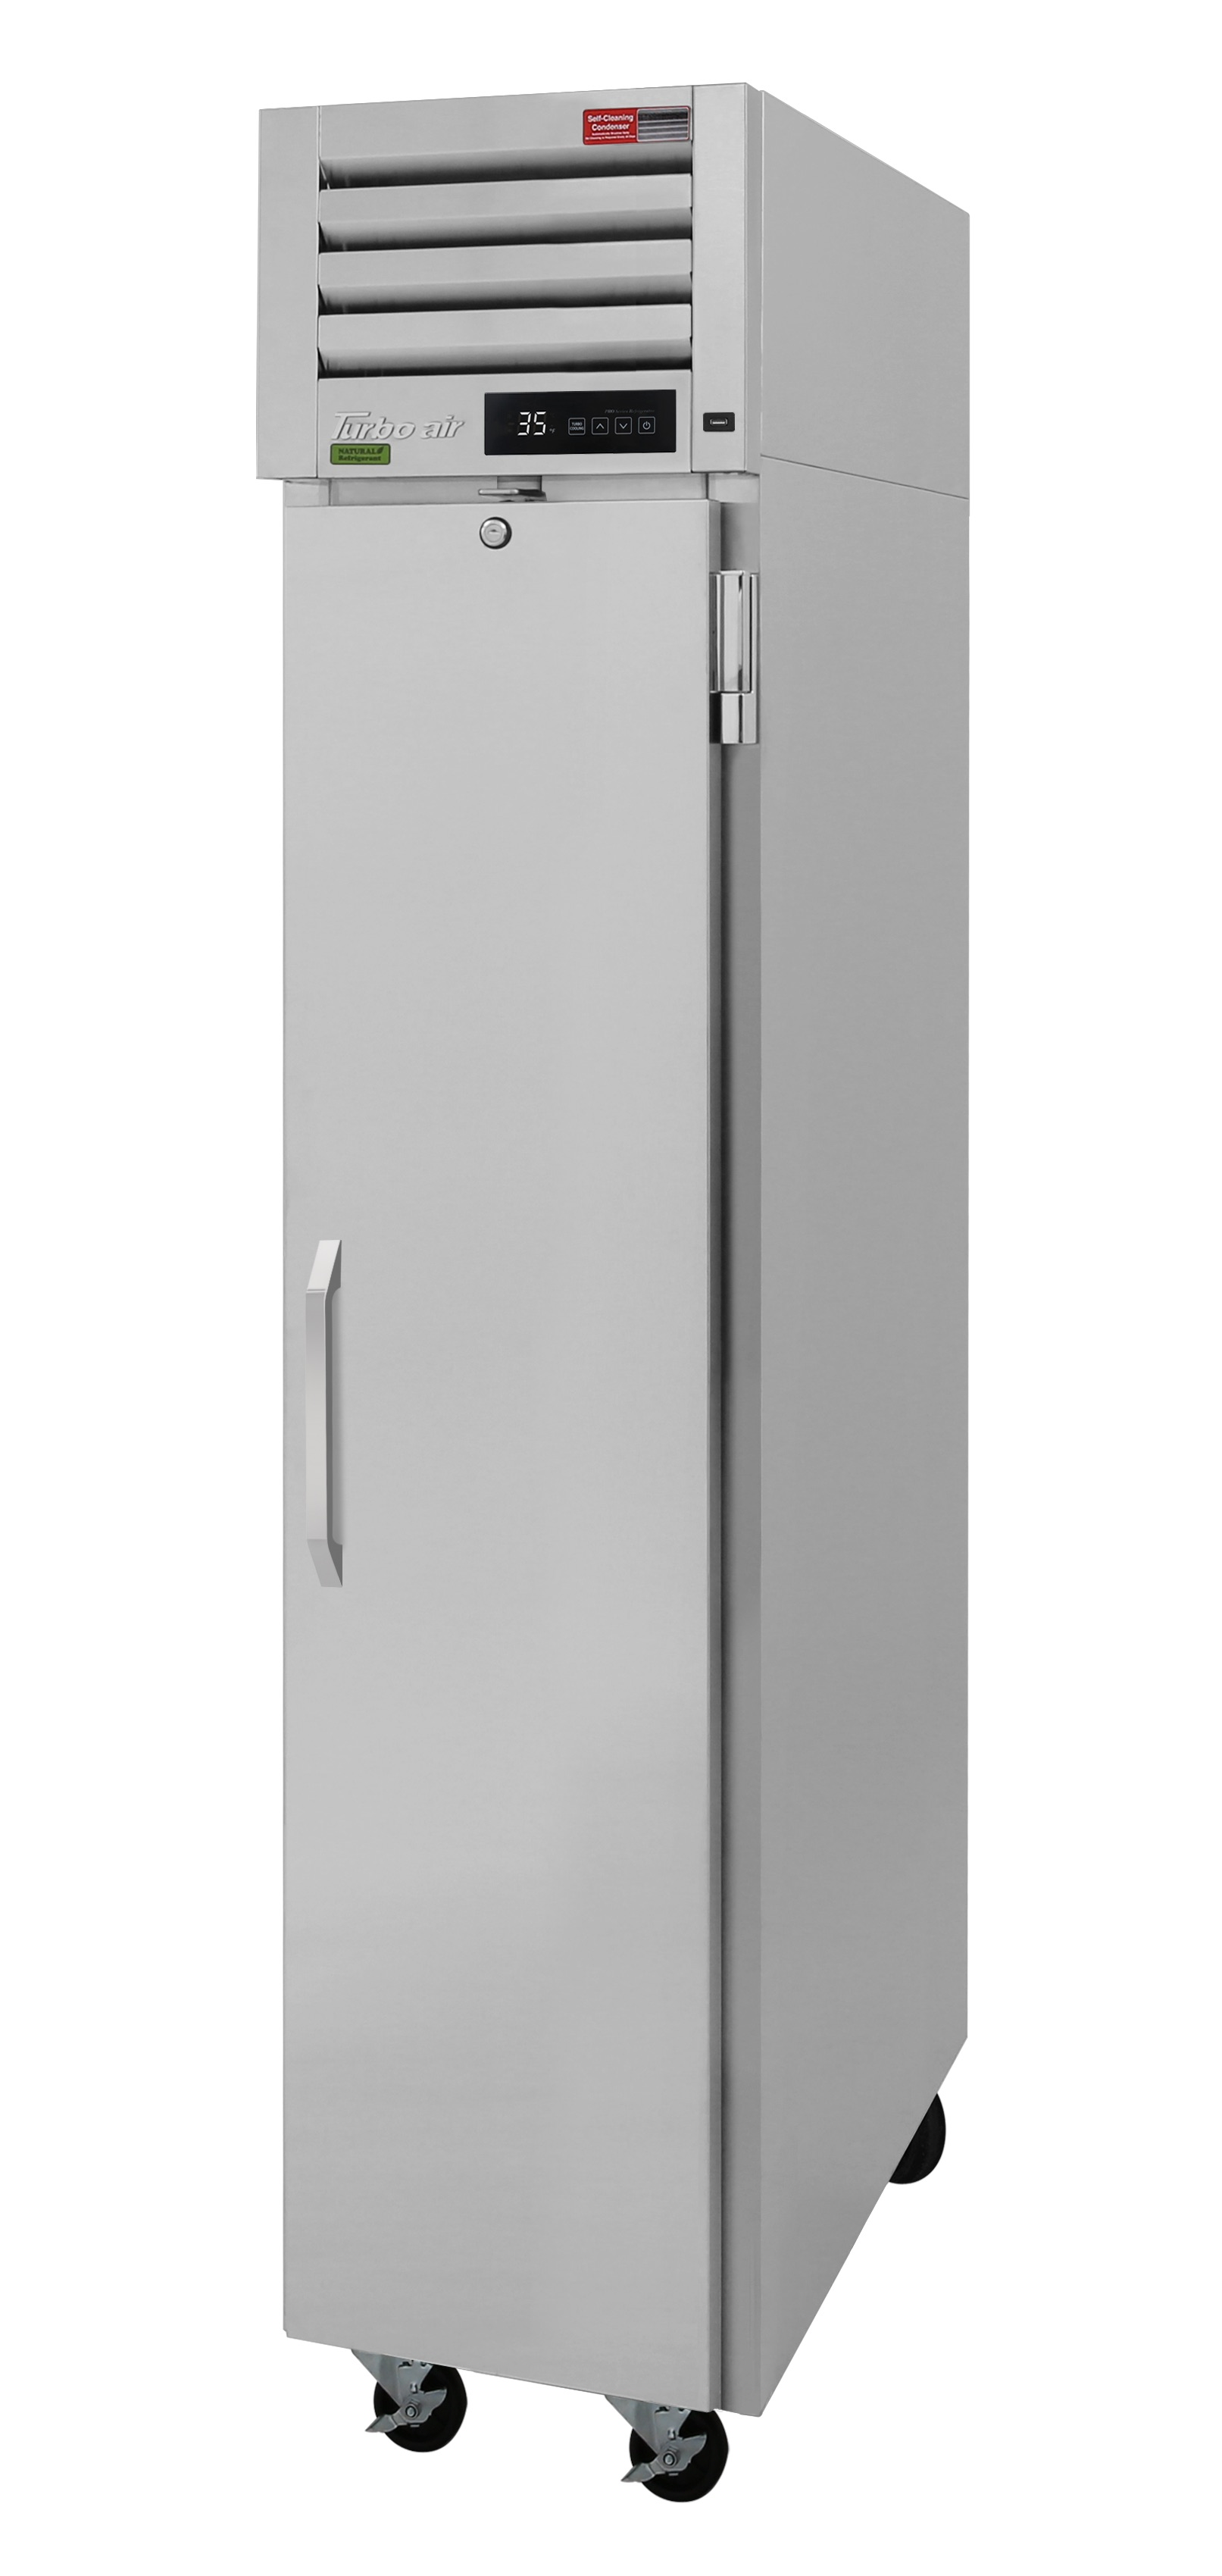 Turbo Air PRO-15-2R-N pro series - reach in refrigerator